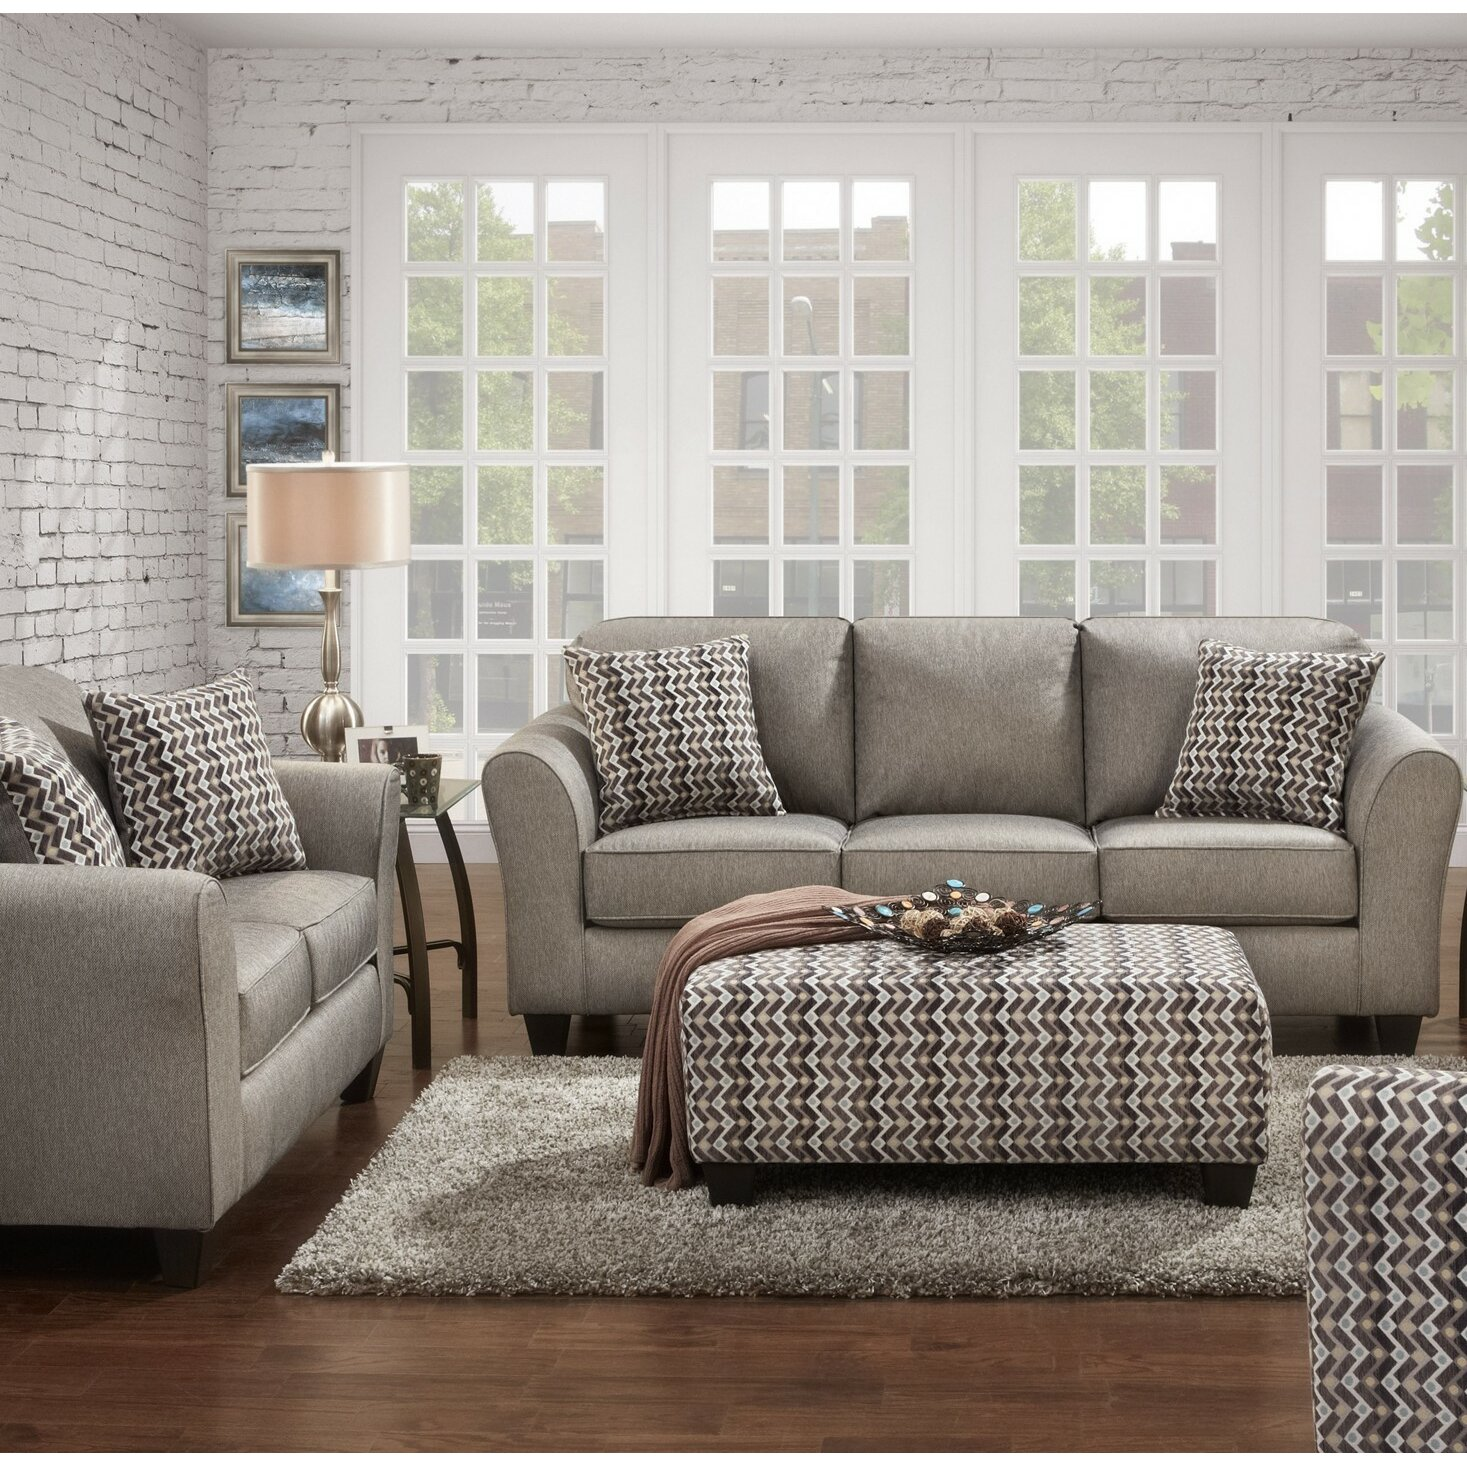 brayden studio leos 3 piece living room set. Black Bedroom Furniture Sets. Home Design Ideas